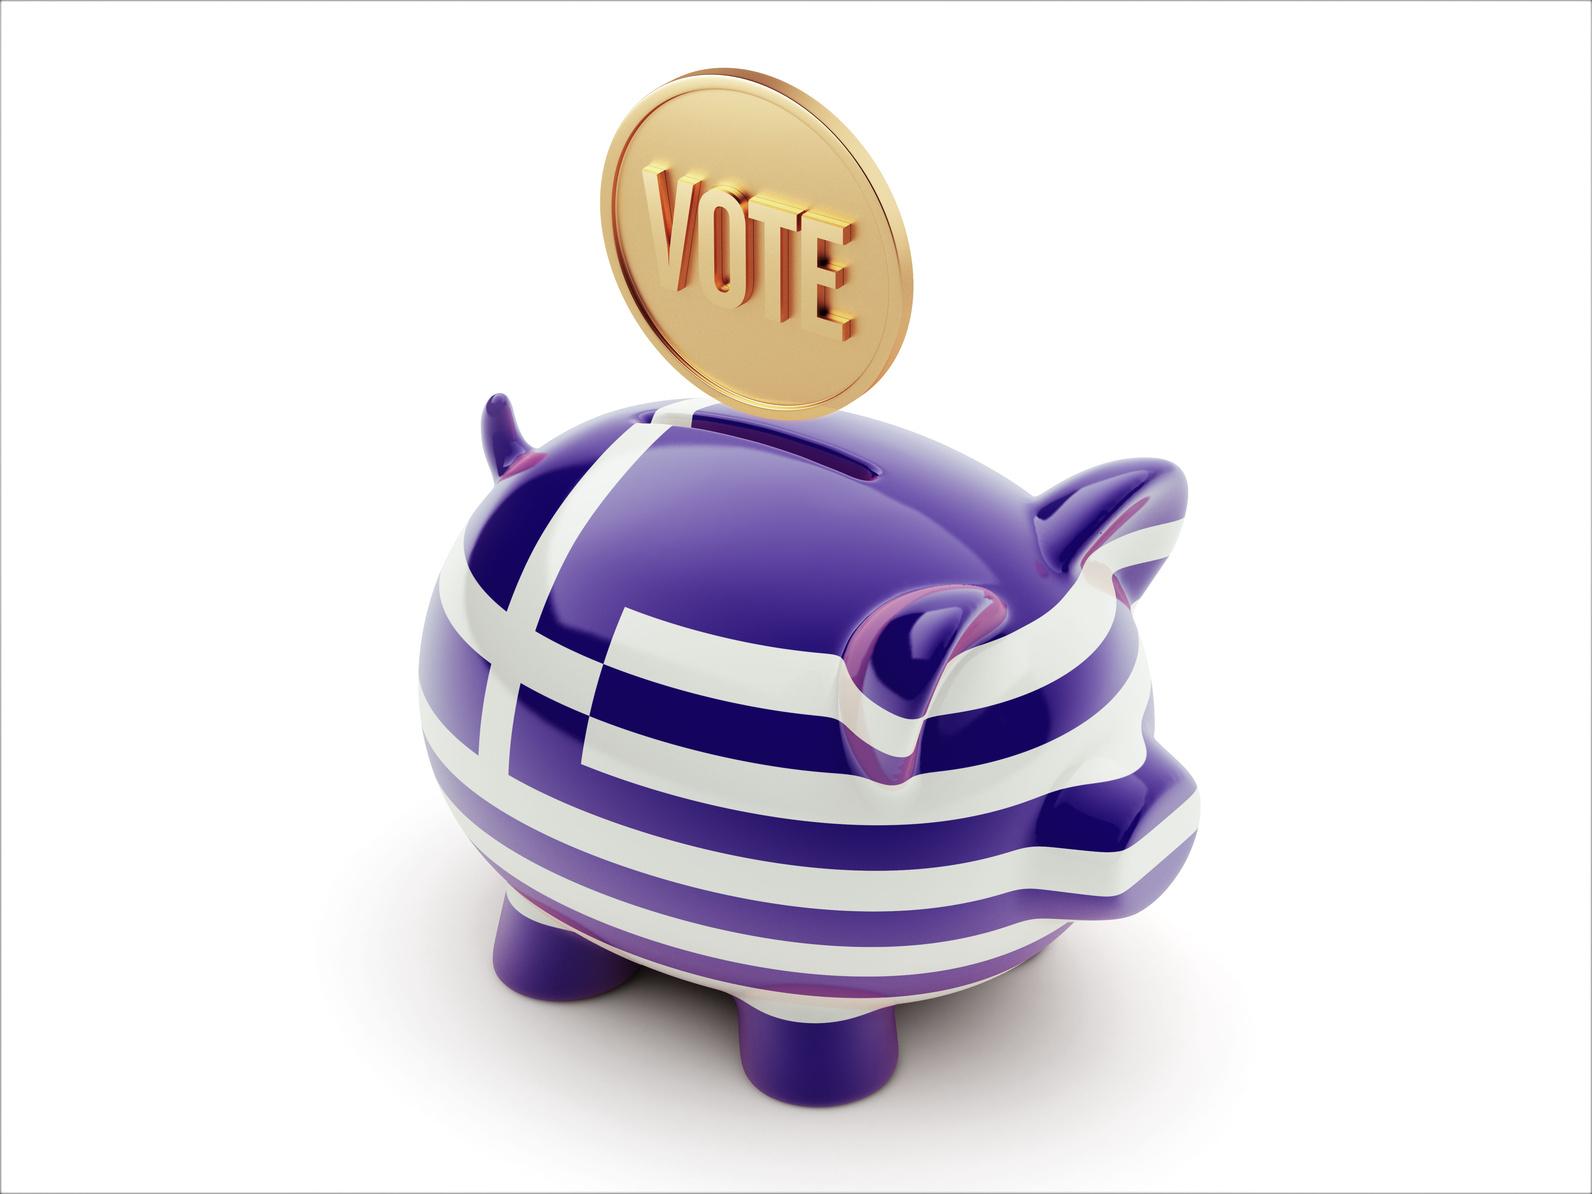 Greece Vote Concept Piggy Concept